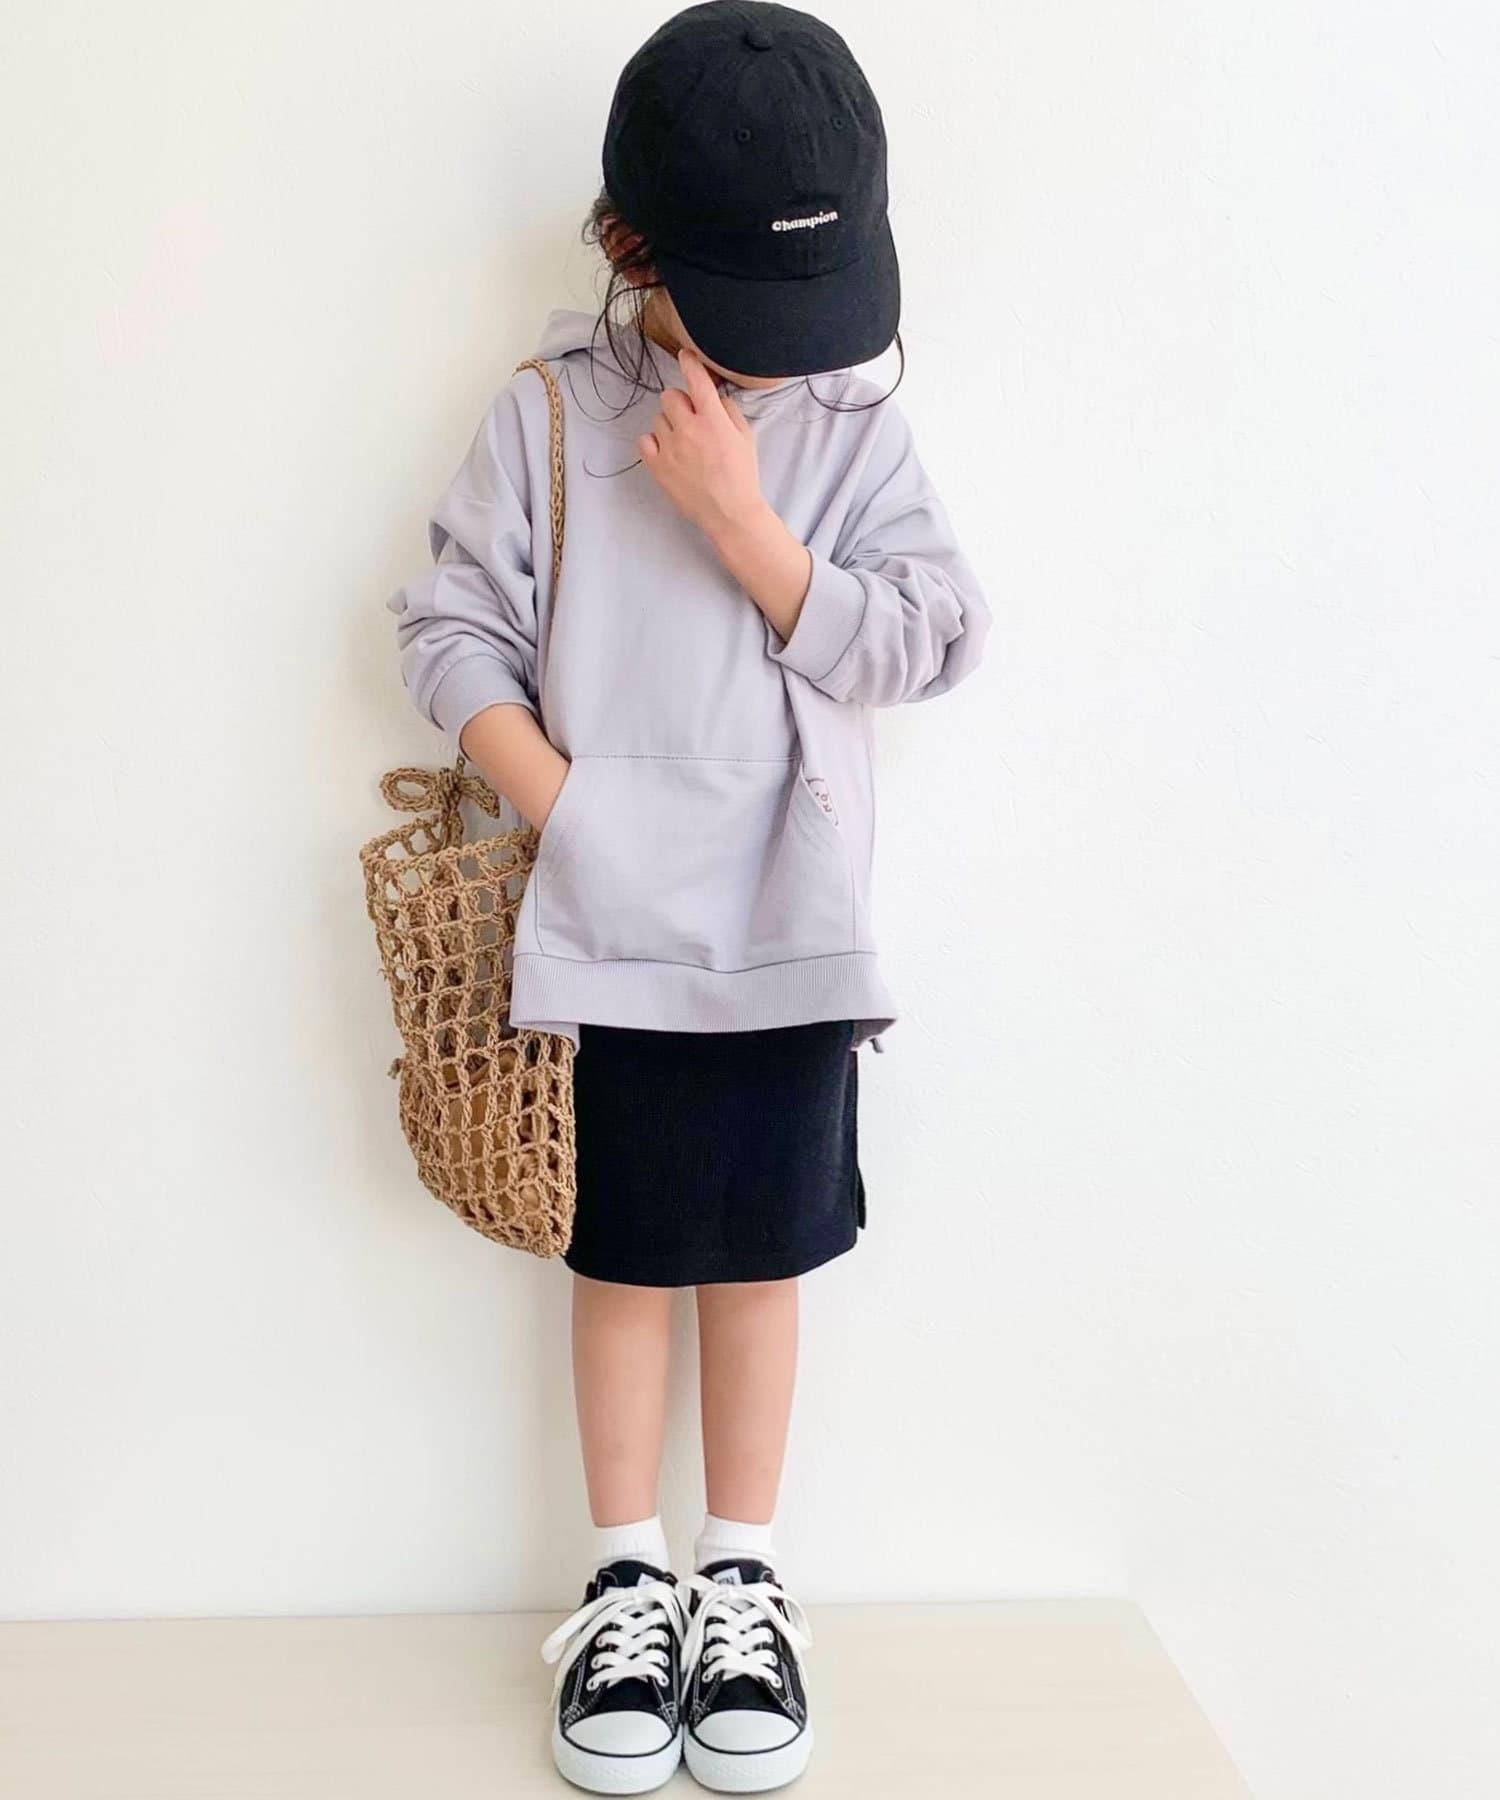 CIAOPANIC TYPY(チャオパニックティピー) キッズ 【KIDS】【すみっコぐらし×TYPY】限定パーカ バイオレット